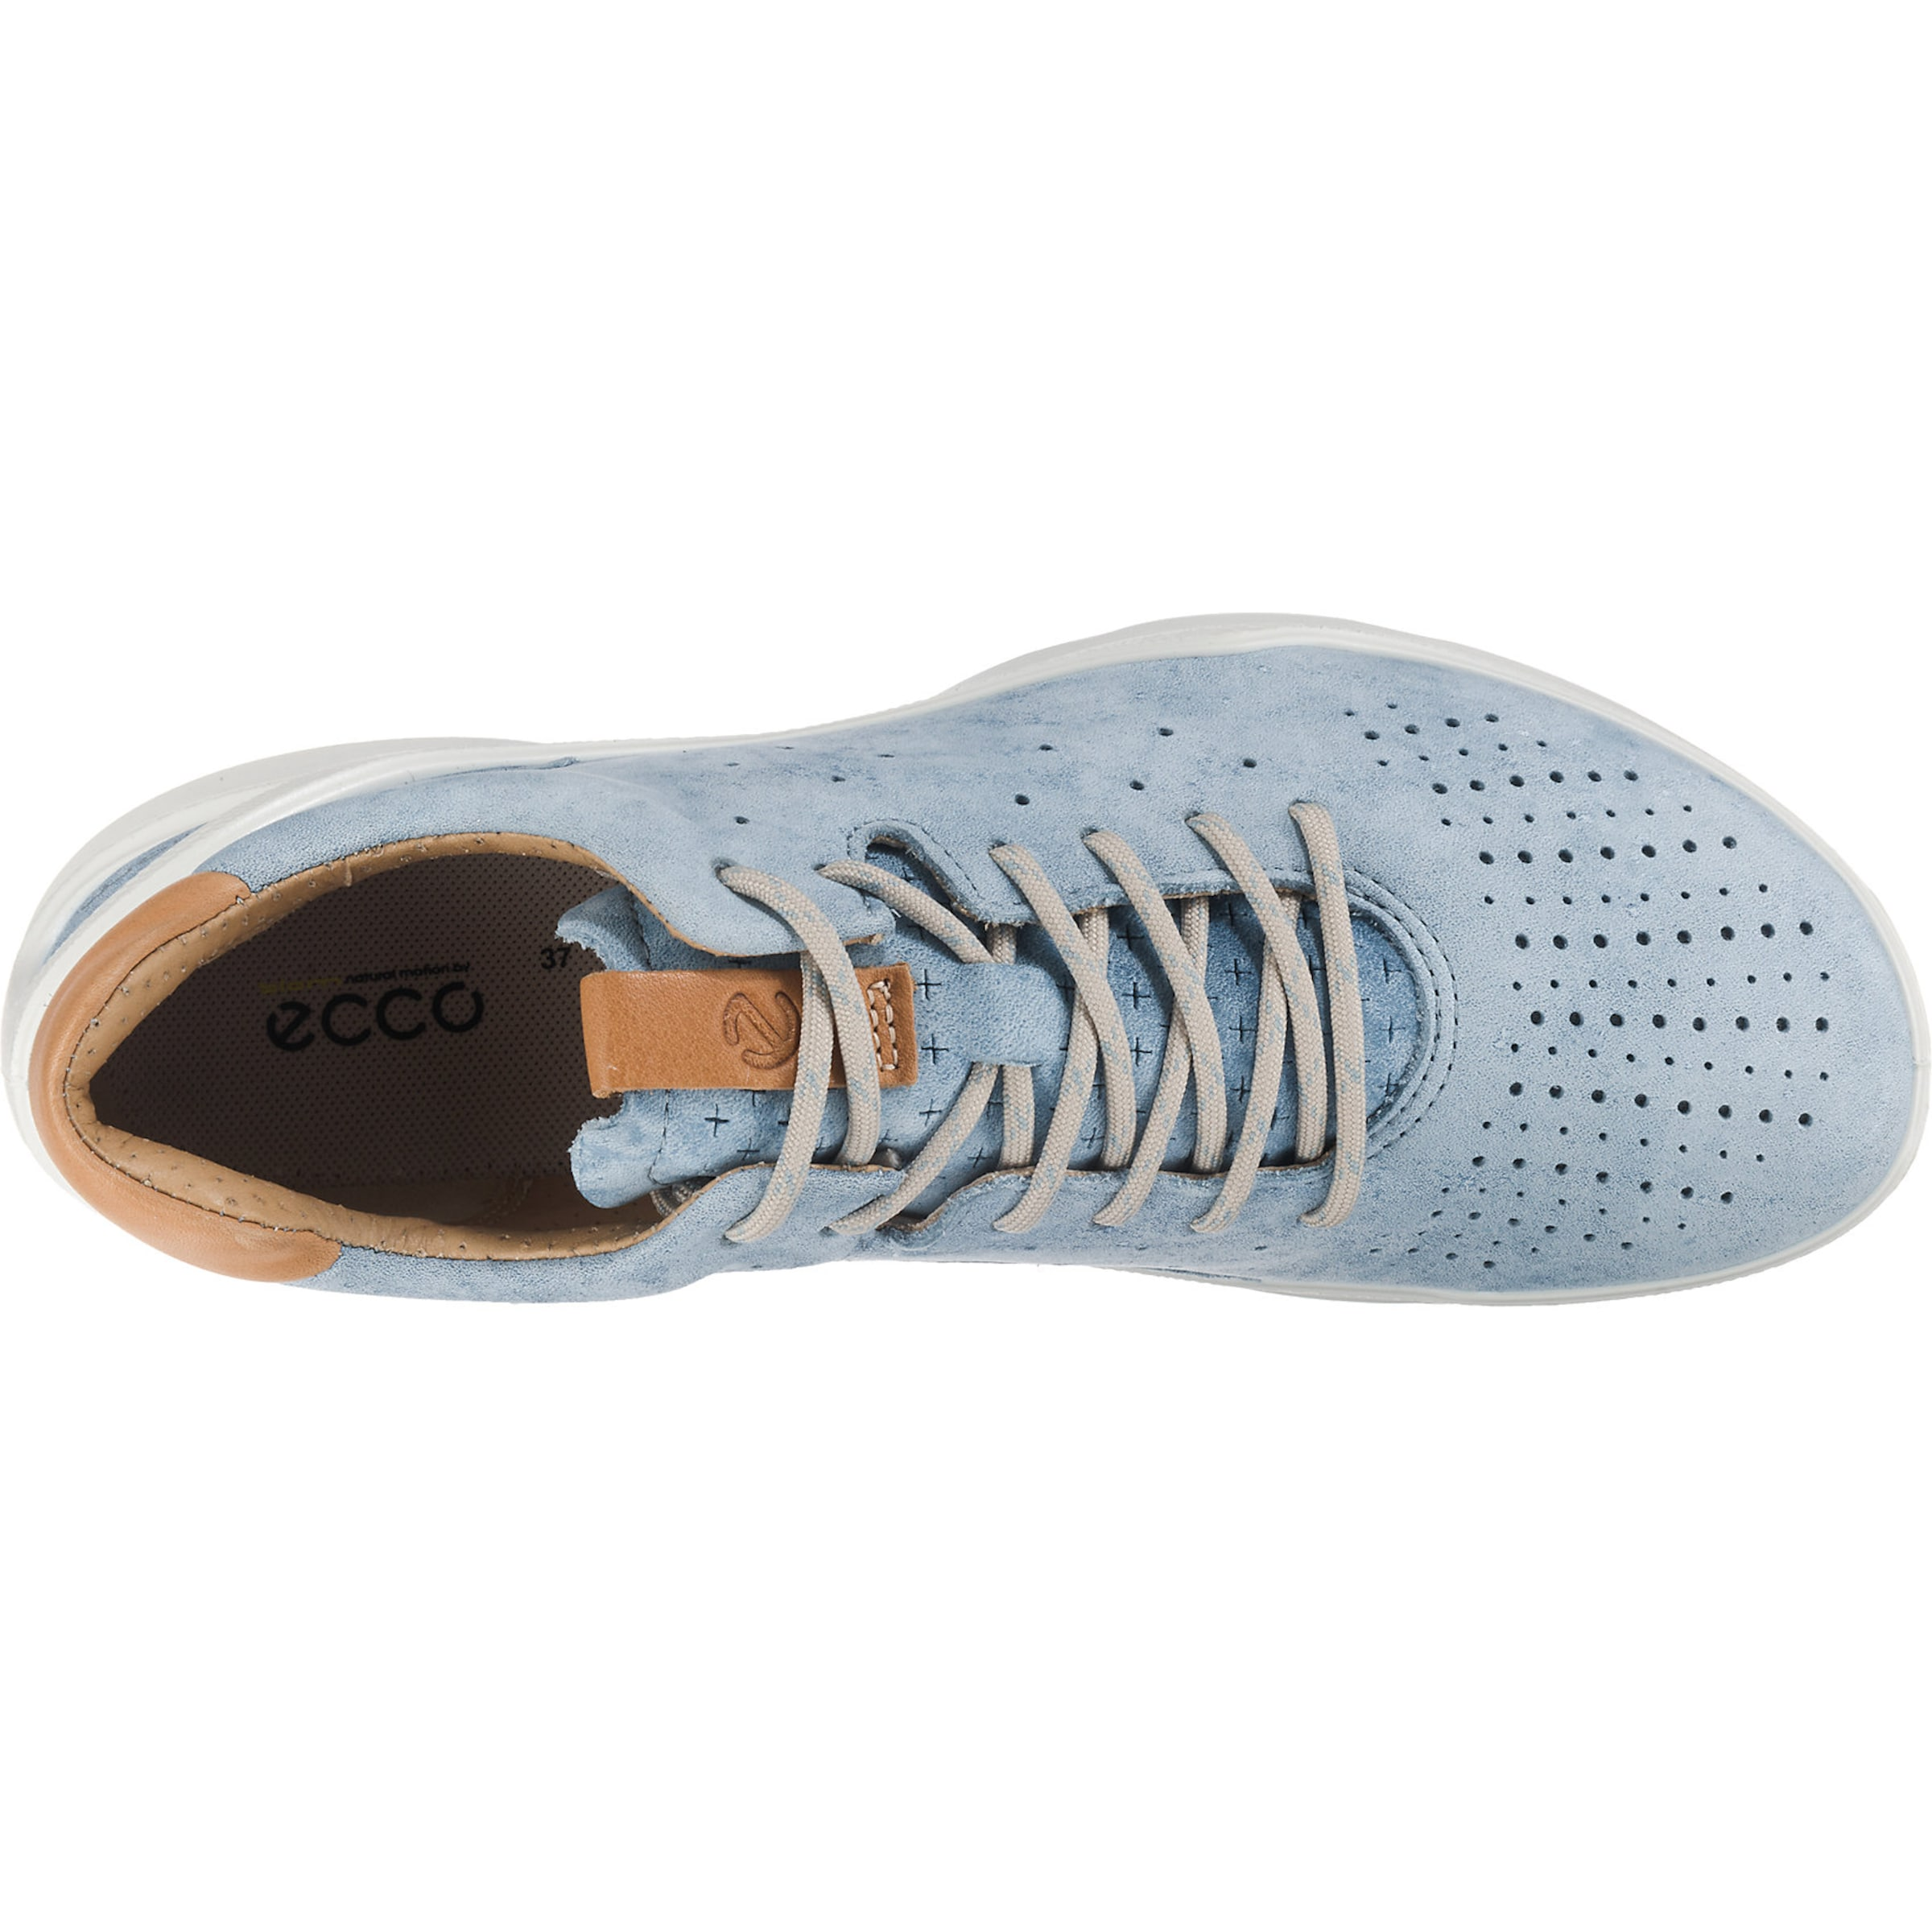 Ecco In HellblauHellbraun Sneakers 'biom Yak' Fjuel Yabuck Navy PkZuXi